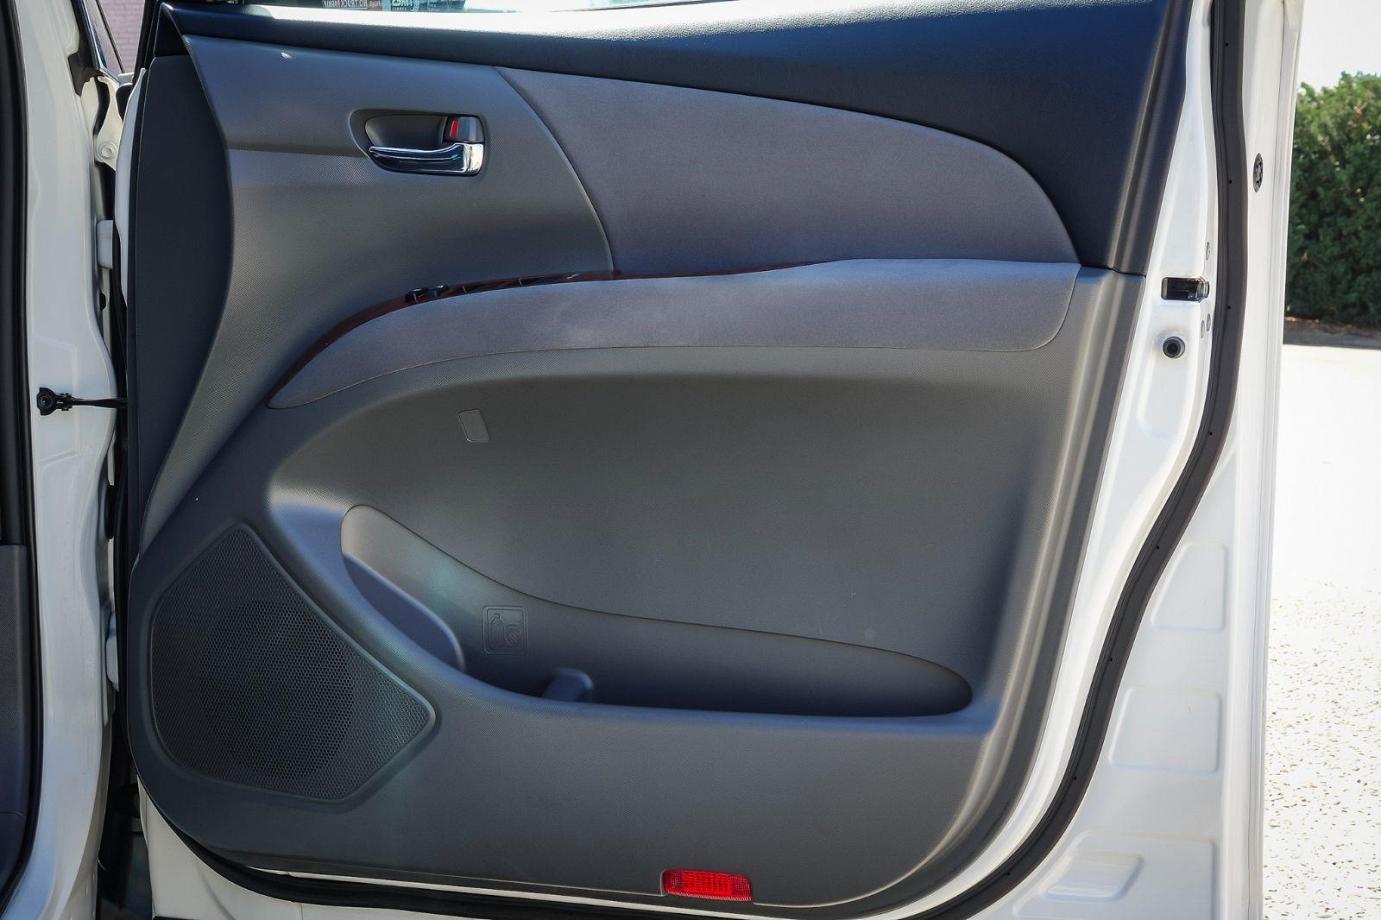 2010 Toyota Estima ACR50 Aeras G Edition Wagon 7st 5dr Auto 2.4i